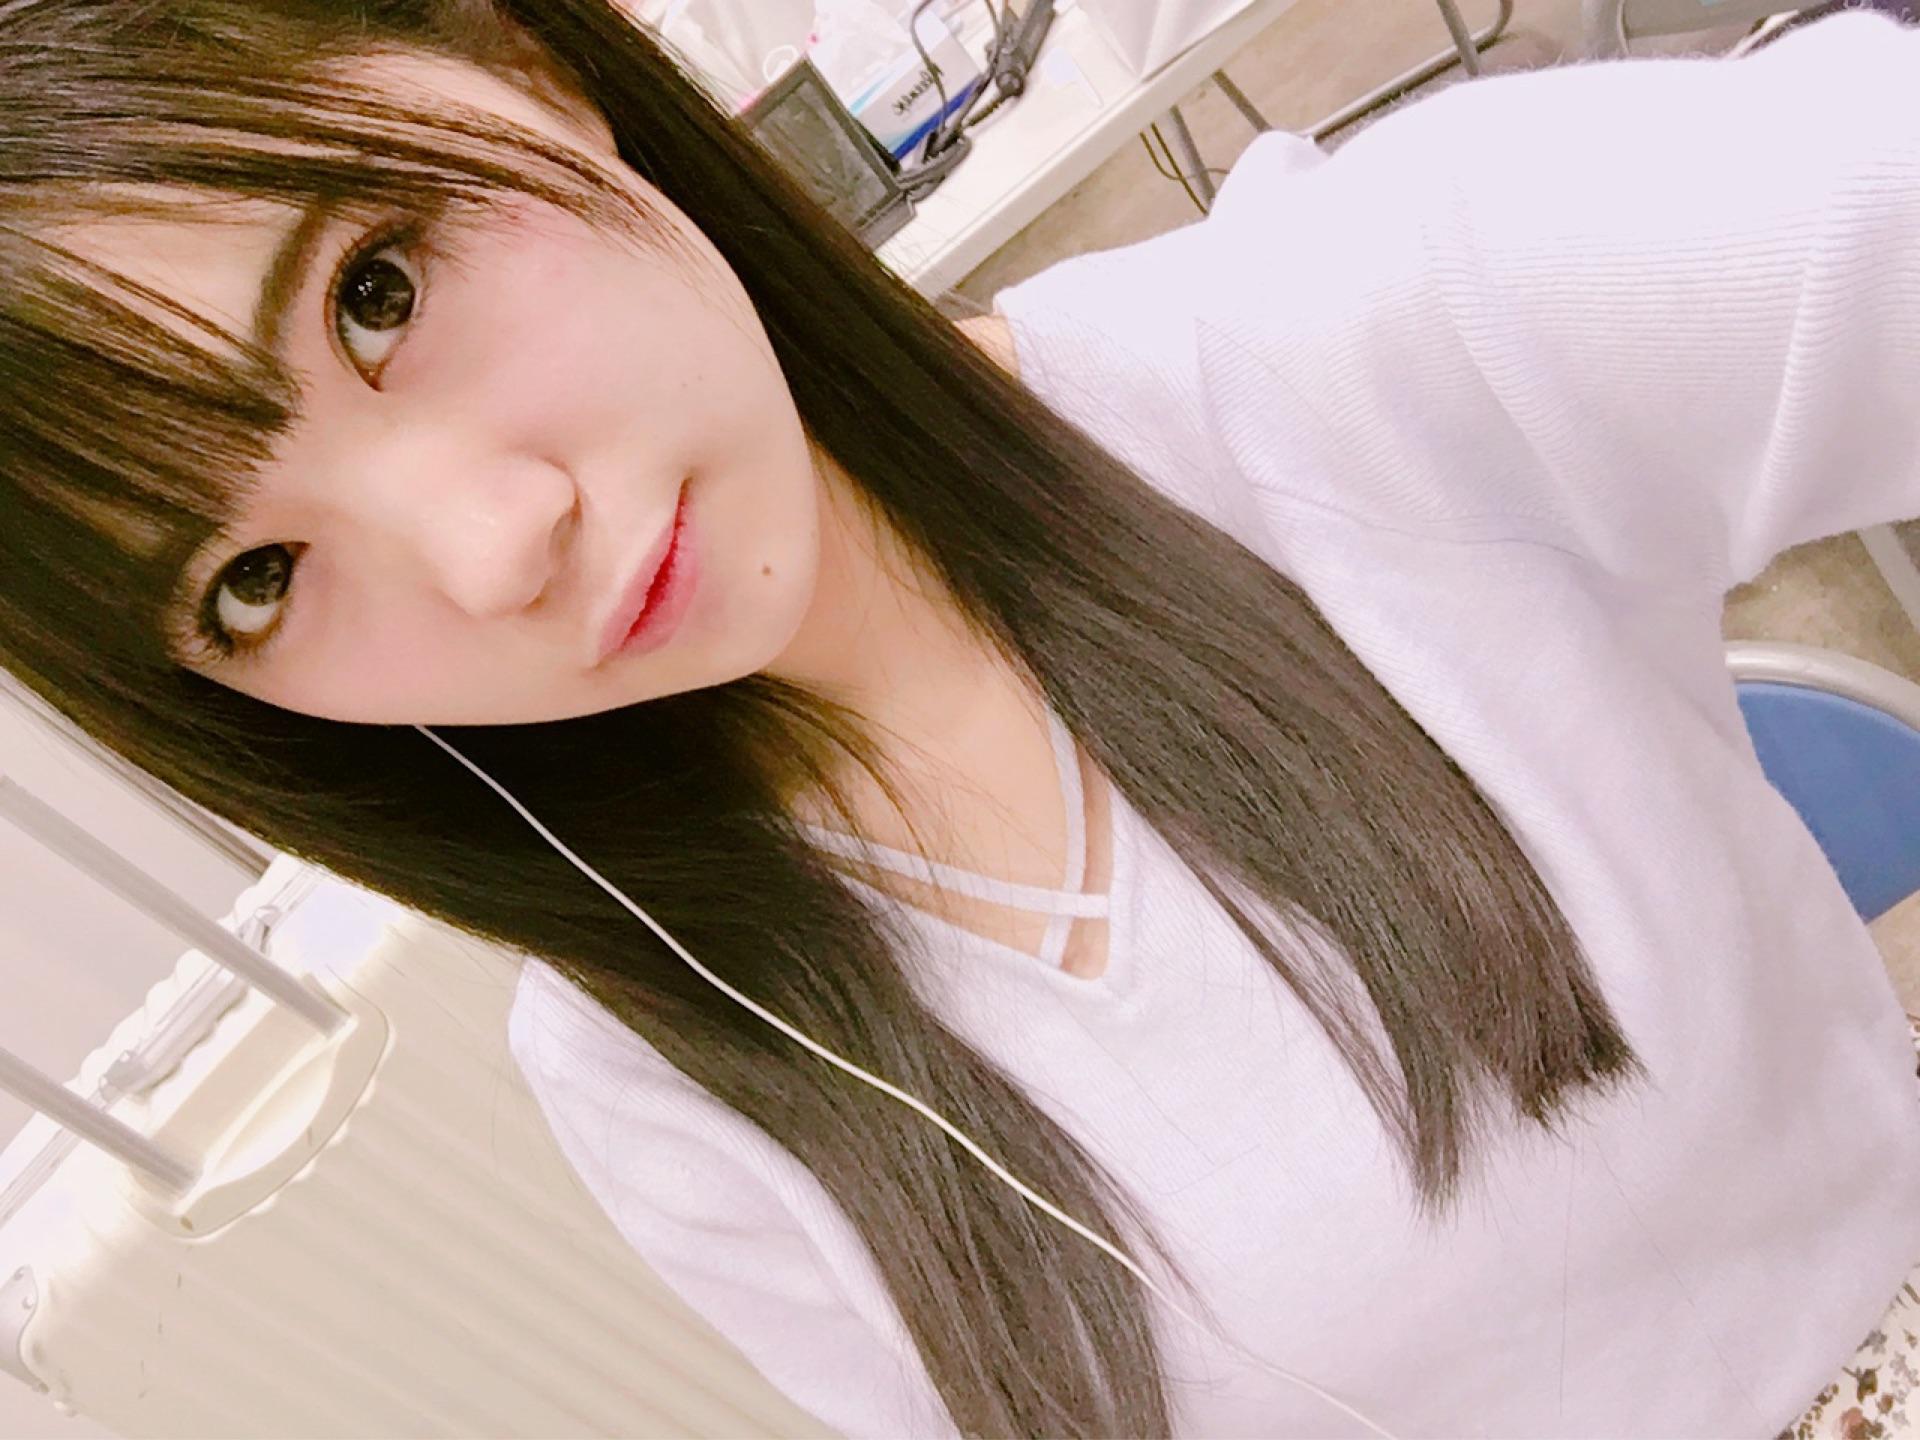 【HKT48】田中優香ちゃん応援スレ☆22【ゆうたん】©2ch.netYouTube動画>8本 ->画像>660枚